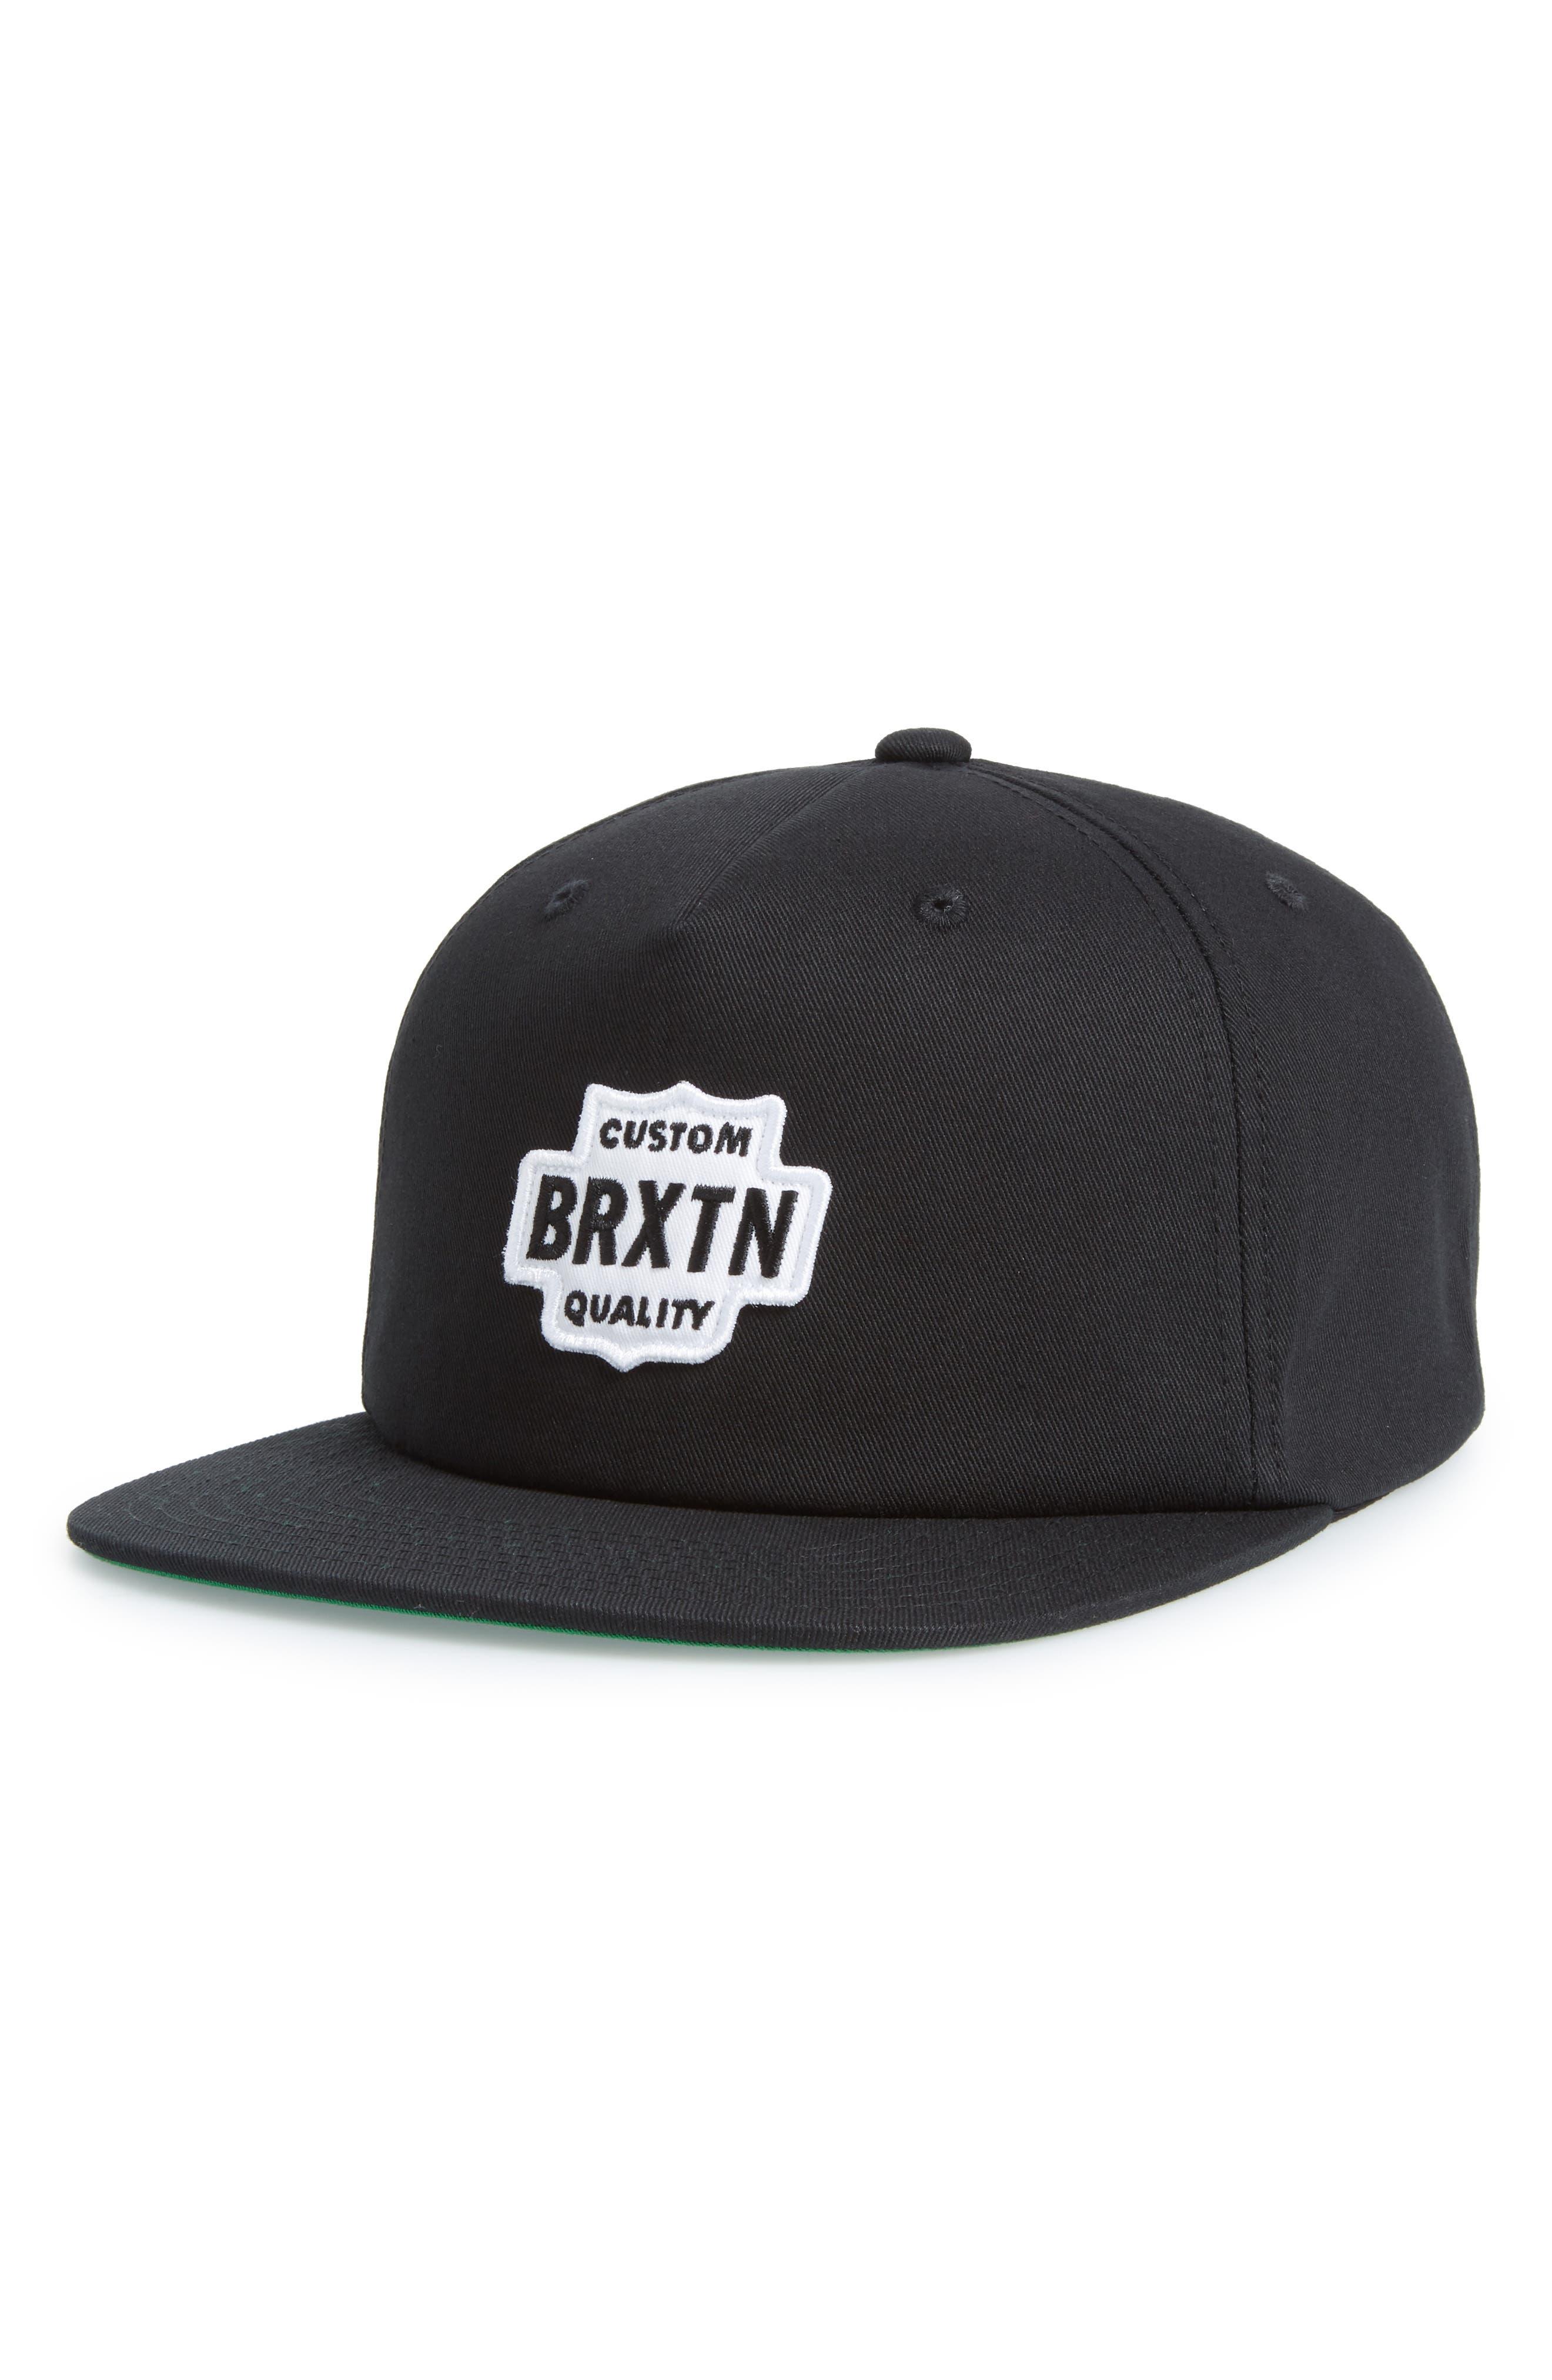 Garth Flat Brimmed Cap,                             Main thumbnail 1, color,                             BLACK/ WHITE